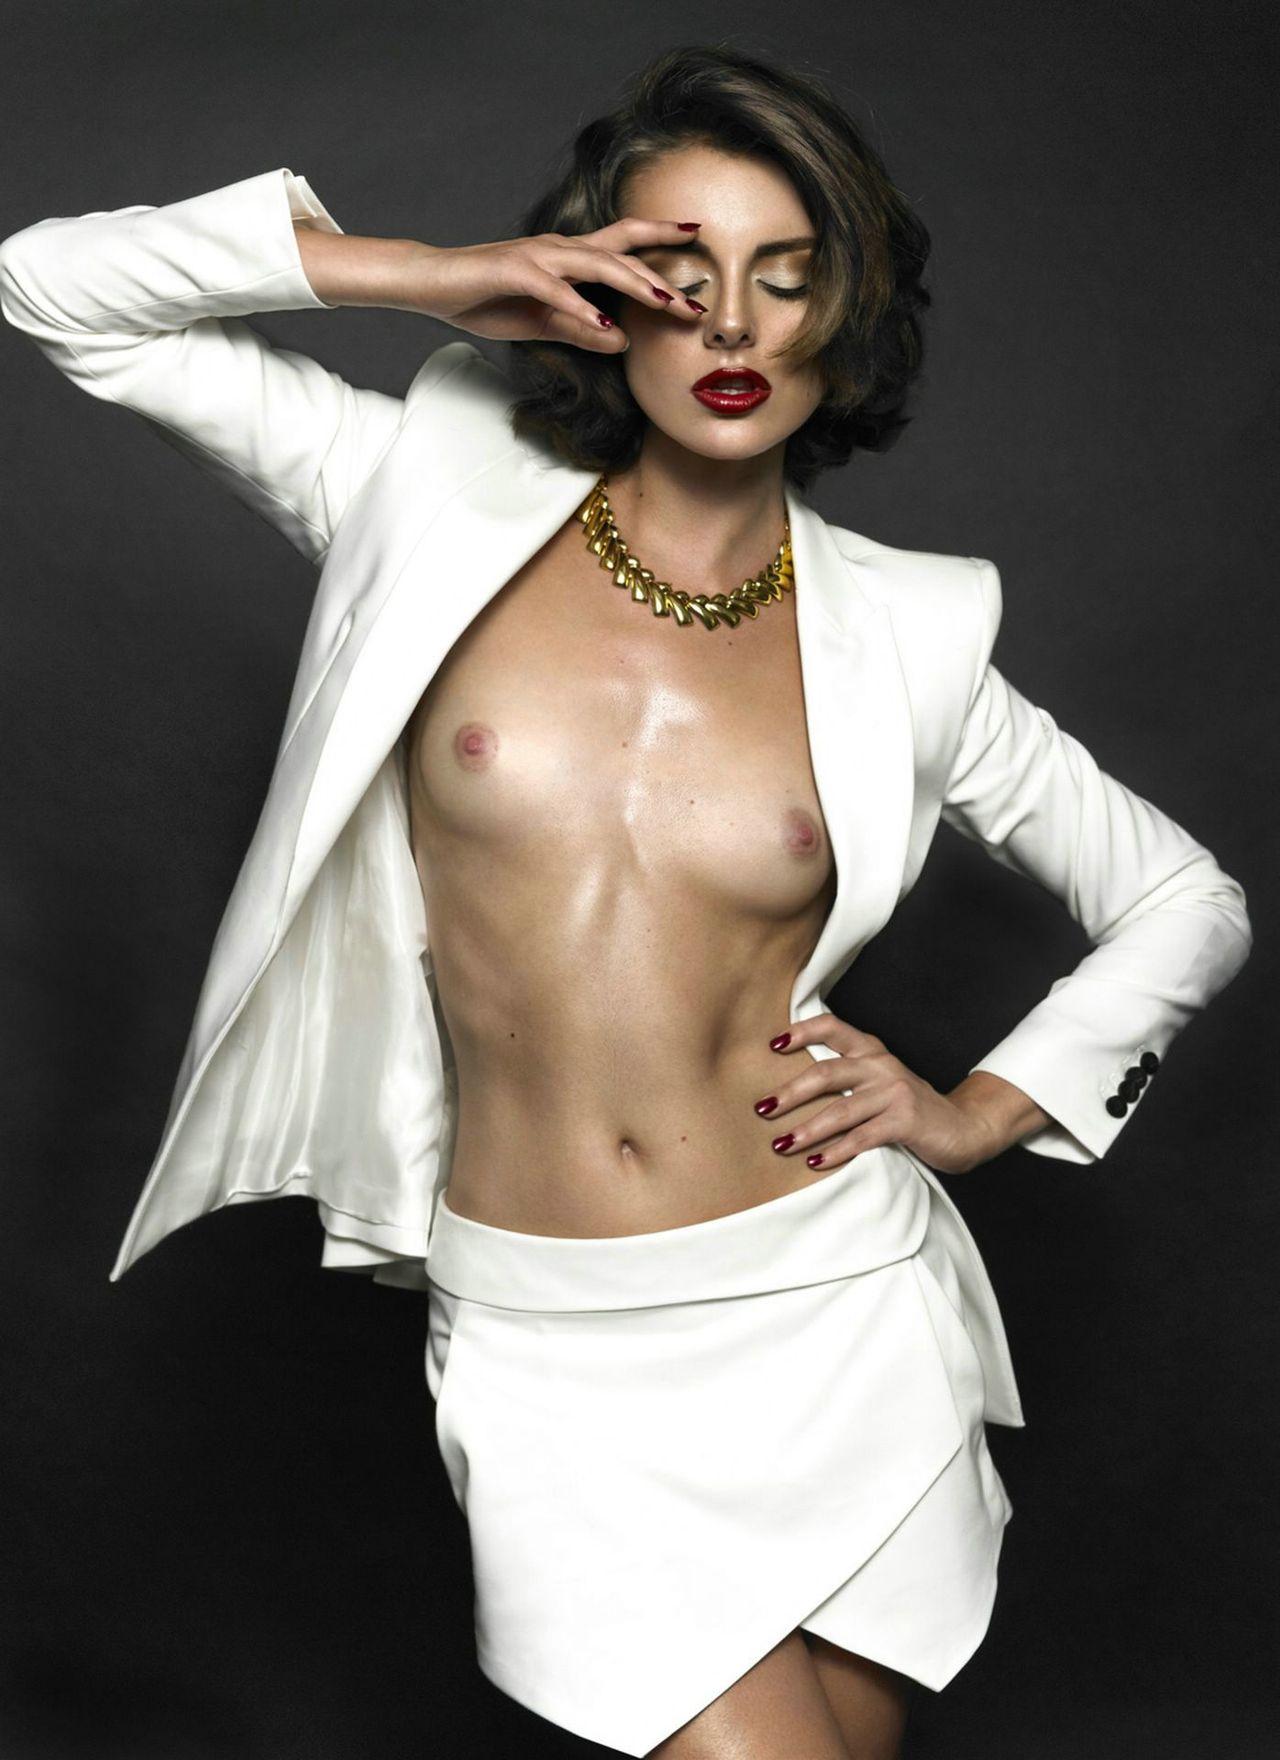 newstar diana amber topless